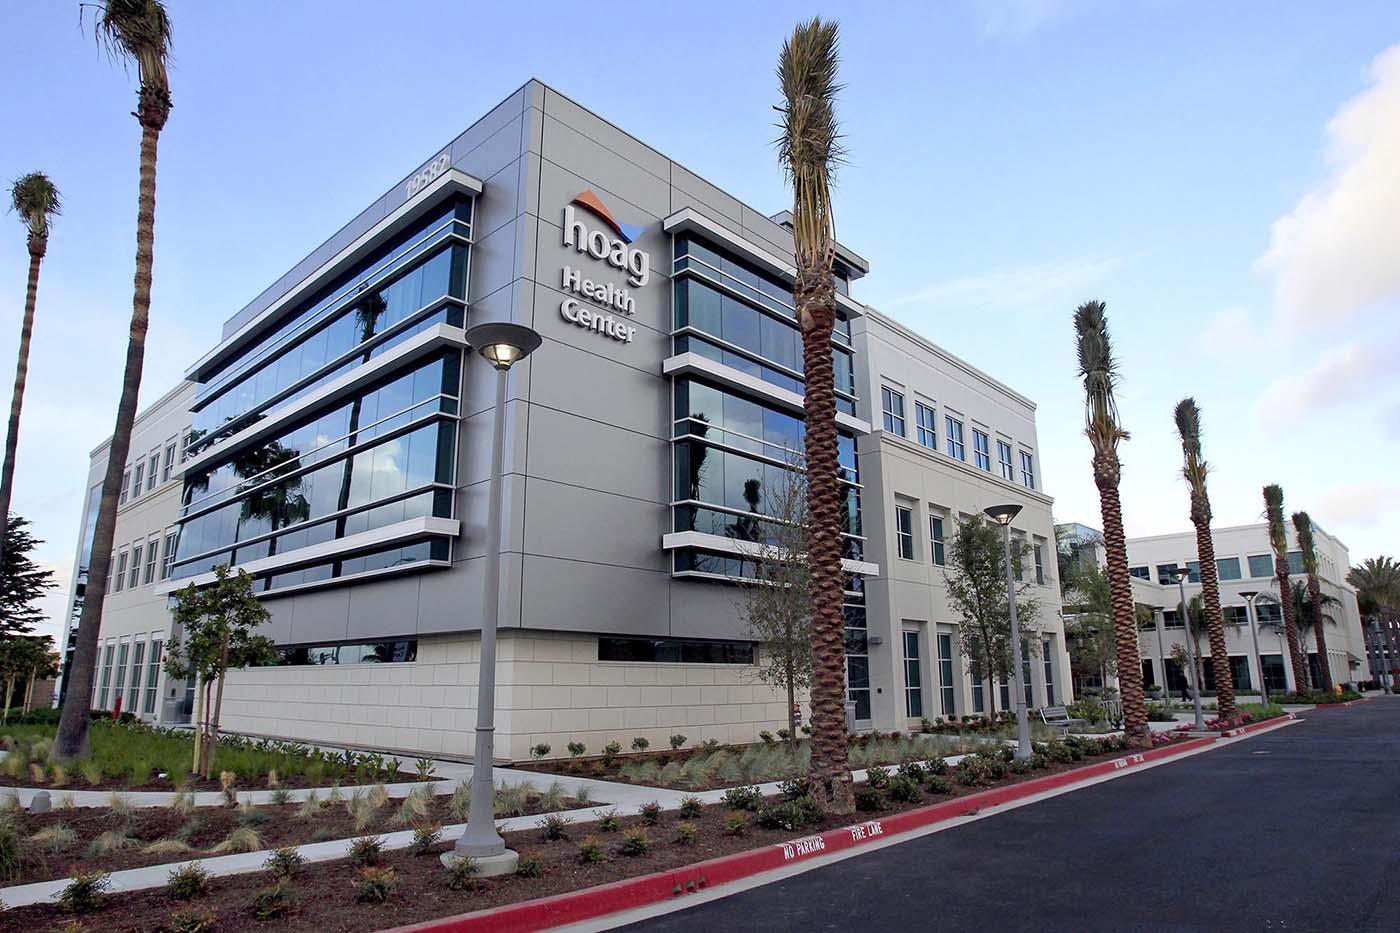 Irvine Plastic Surgeon, Dr. Maan Kattash has an office located at 16305 Sand Canyon Avenue Suite 220, Irvine, CA 92618.